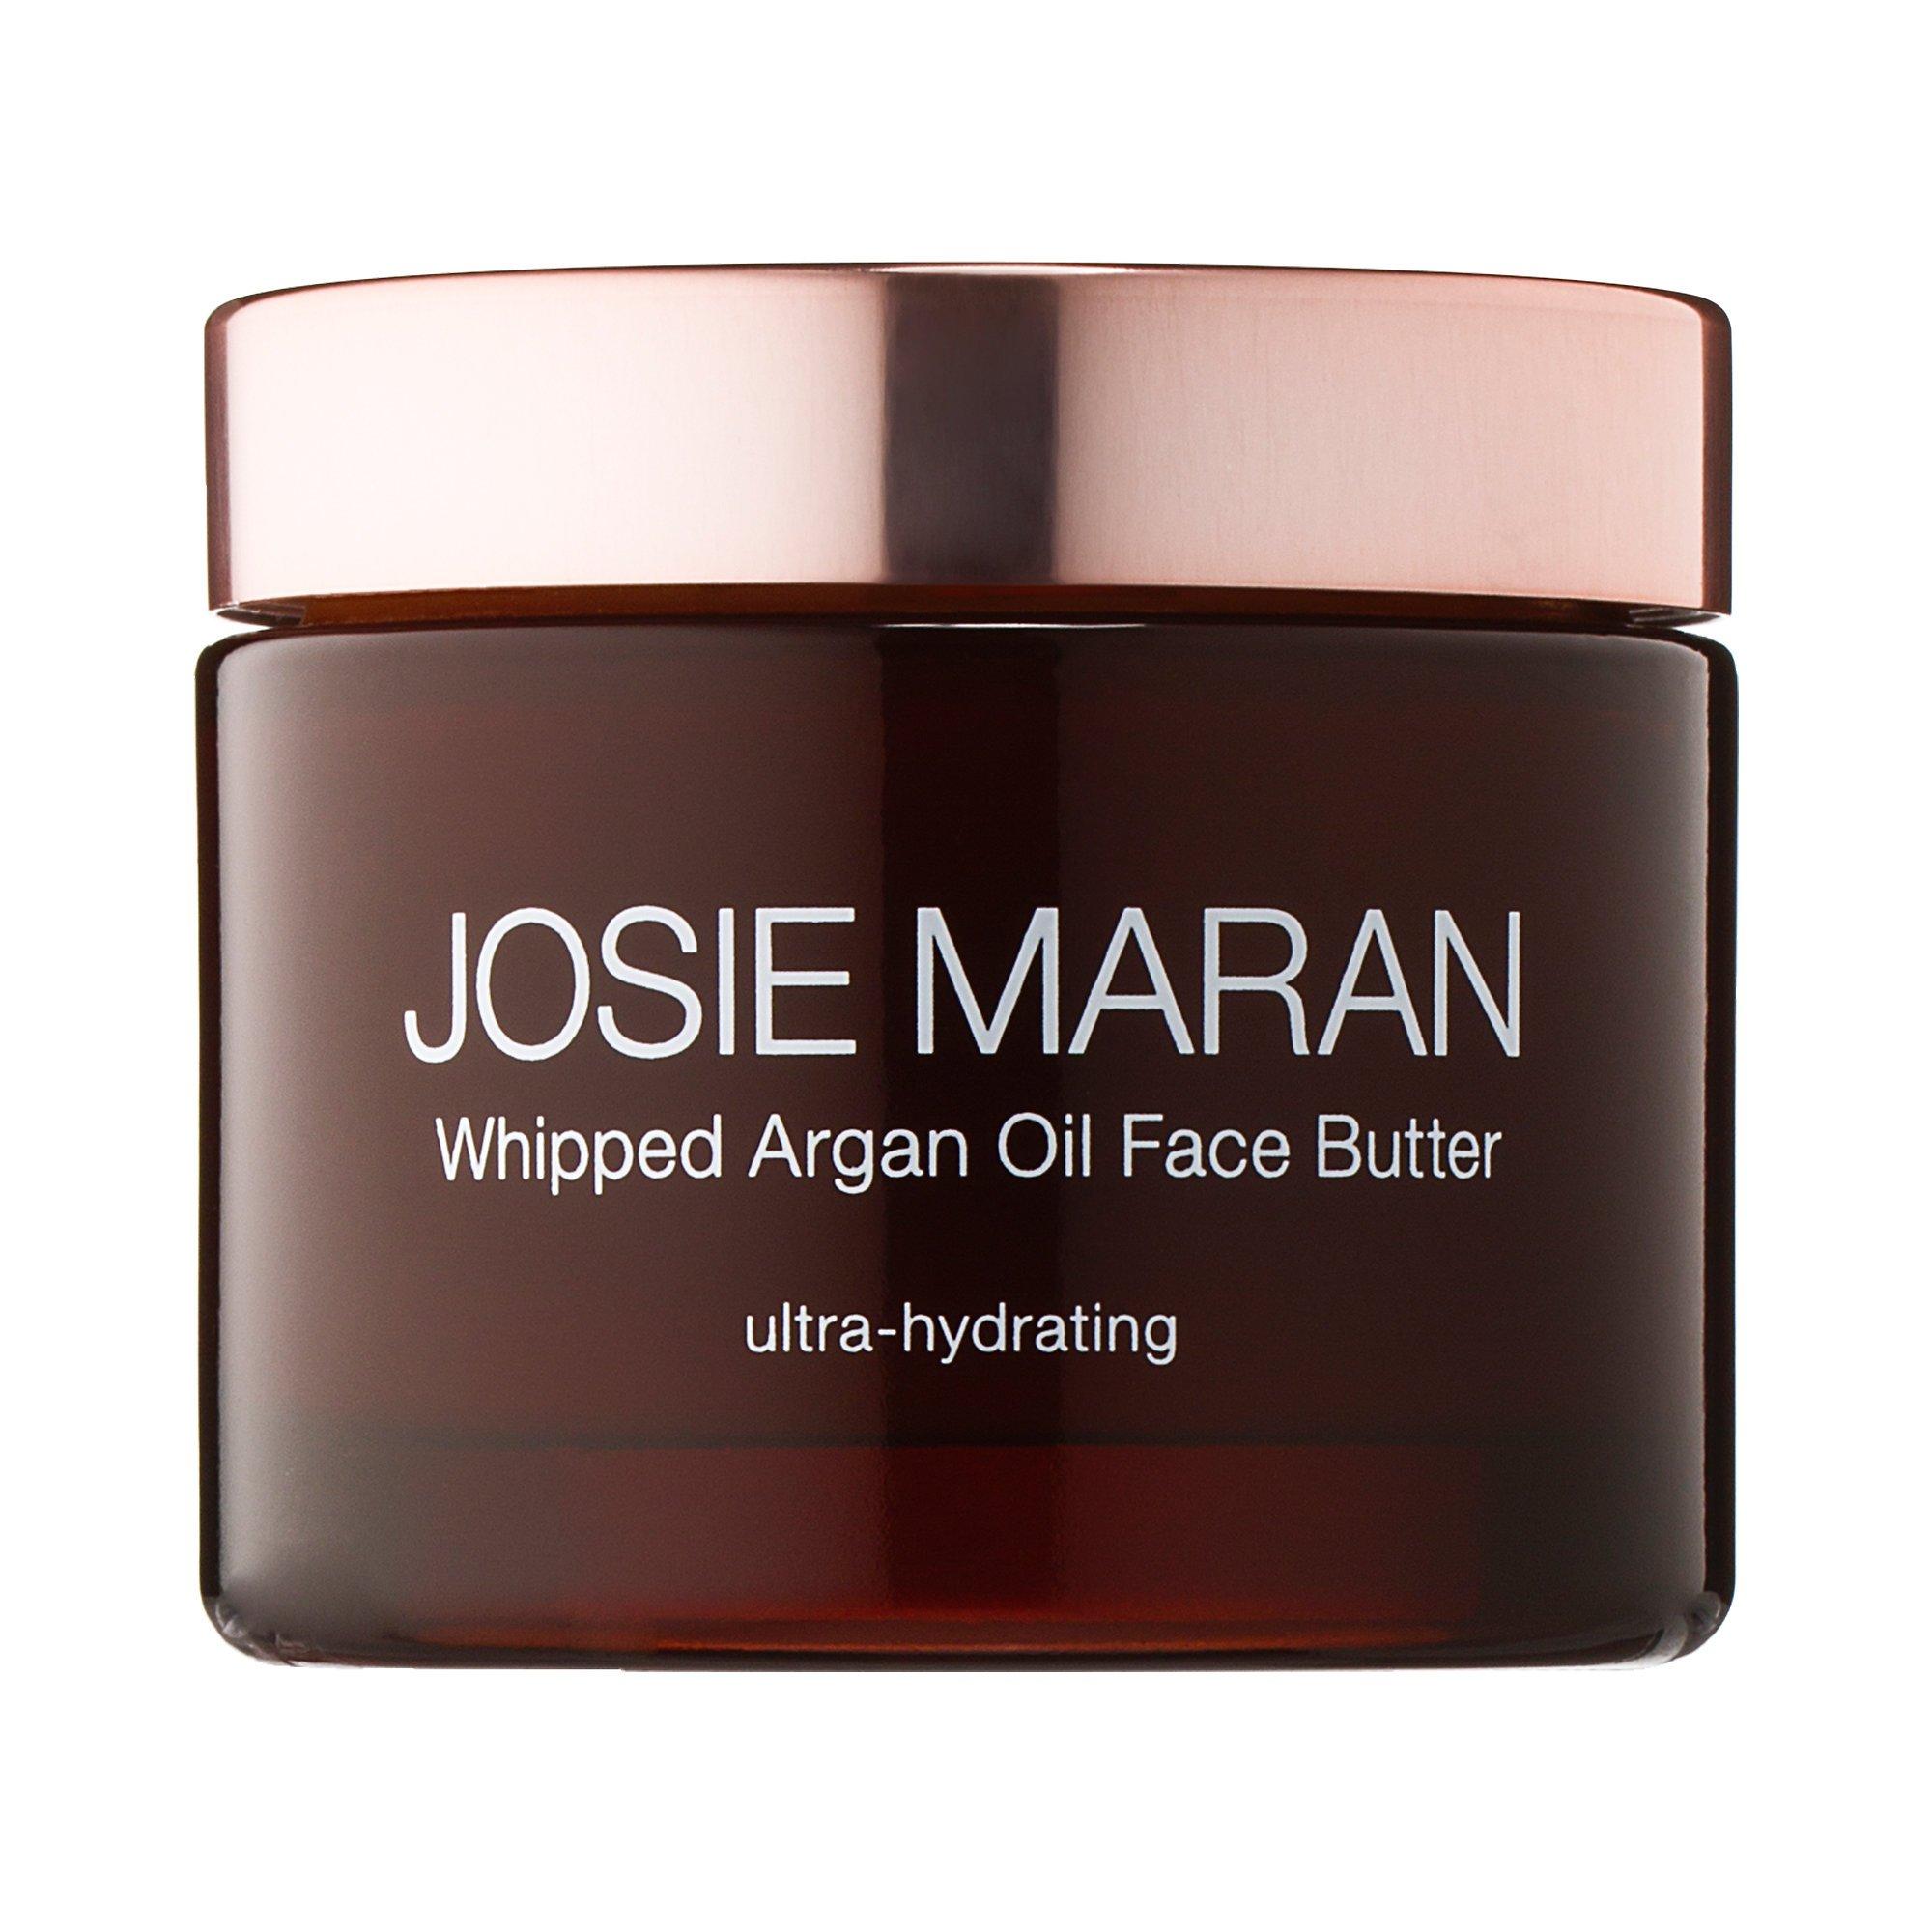 Josie Maran Whipped Argan Oil Face Butter (Full (1.7 fl. oz/50 mL), Unscented)